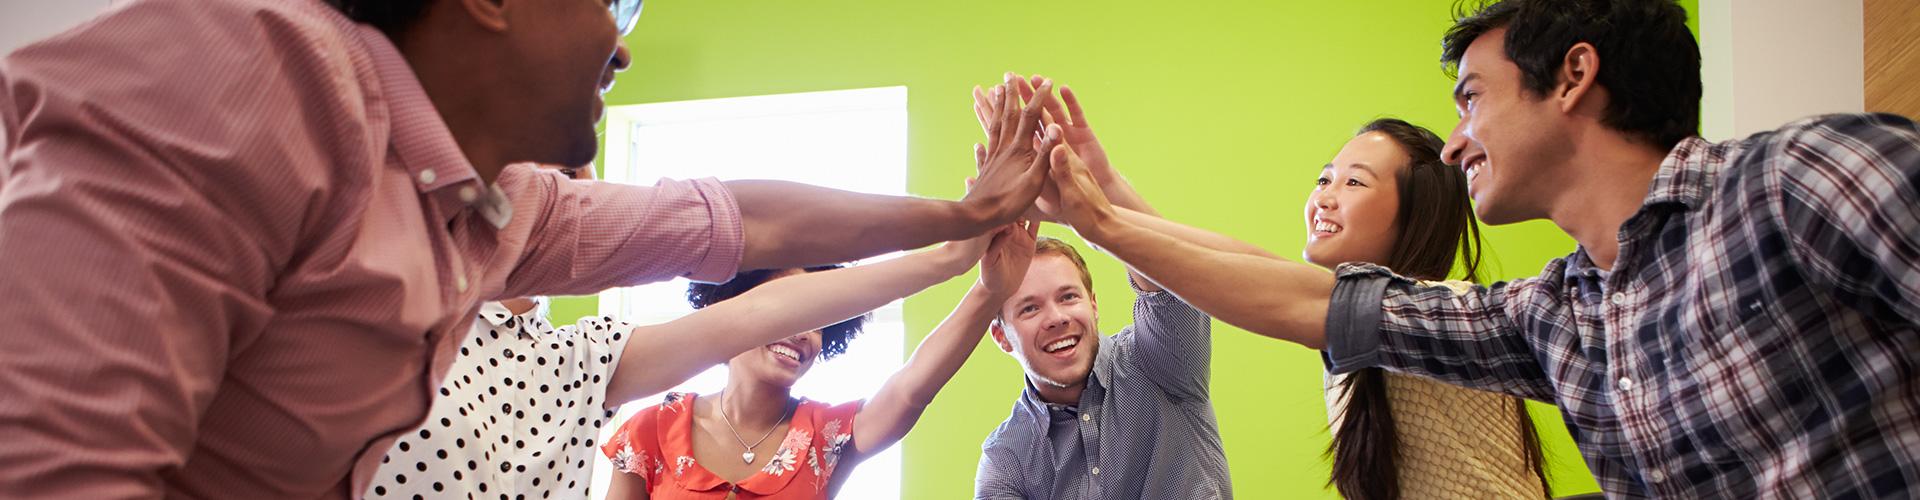 happy office team image